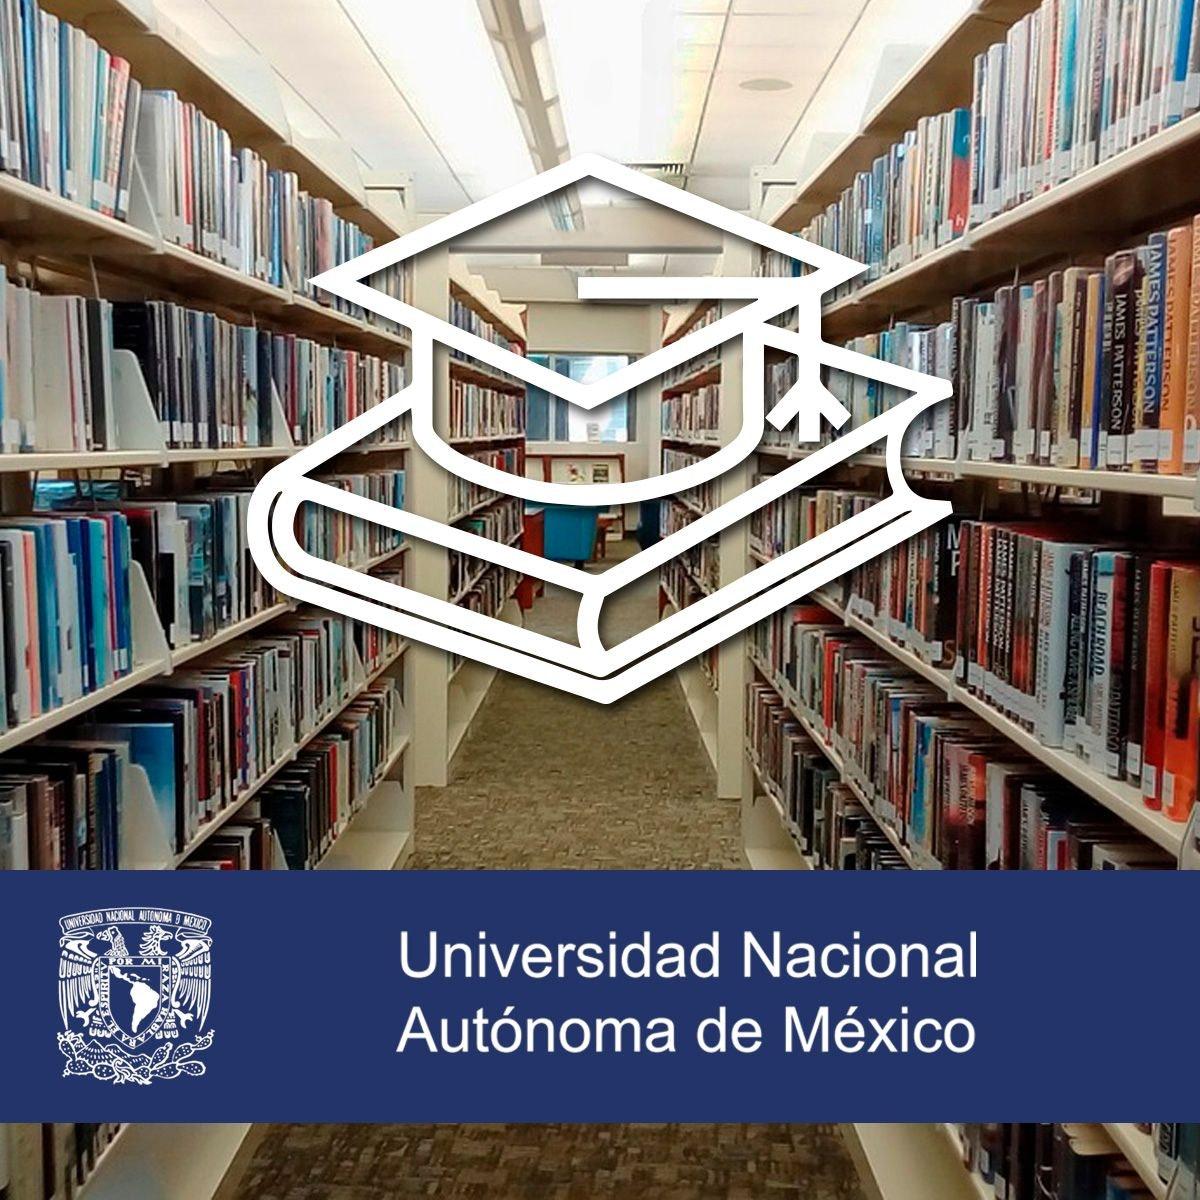 free online courses for https://d3njjcbhbojbot.cloudfront.net/api/utilities/v1/imageproxy/https://s3.amazonaws.com/coursera-course-photos/49/d67ecb9f074c49abab761b21eb5dc1/como_hacer_una_tesis_FINAL.jpg?auto=format%2